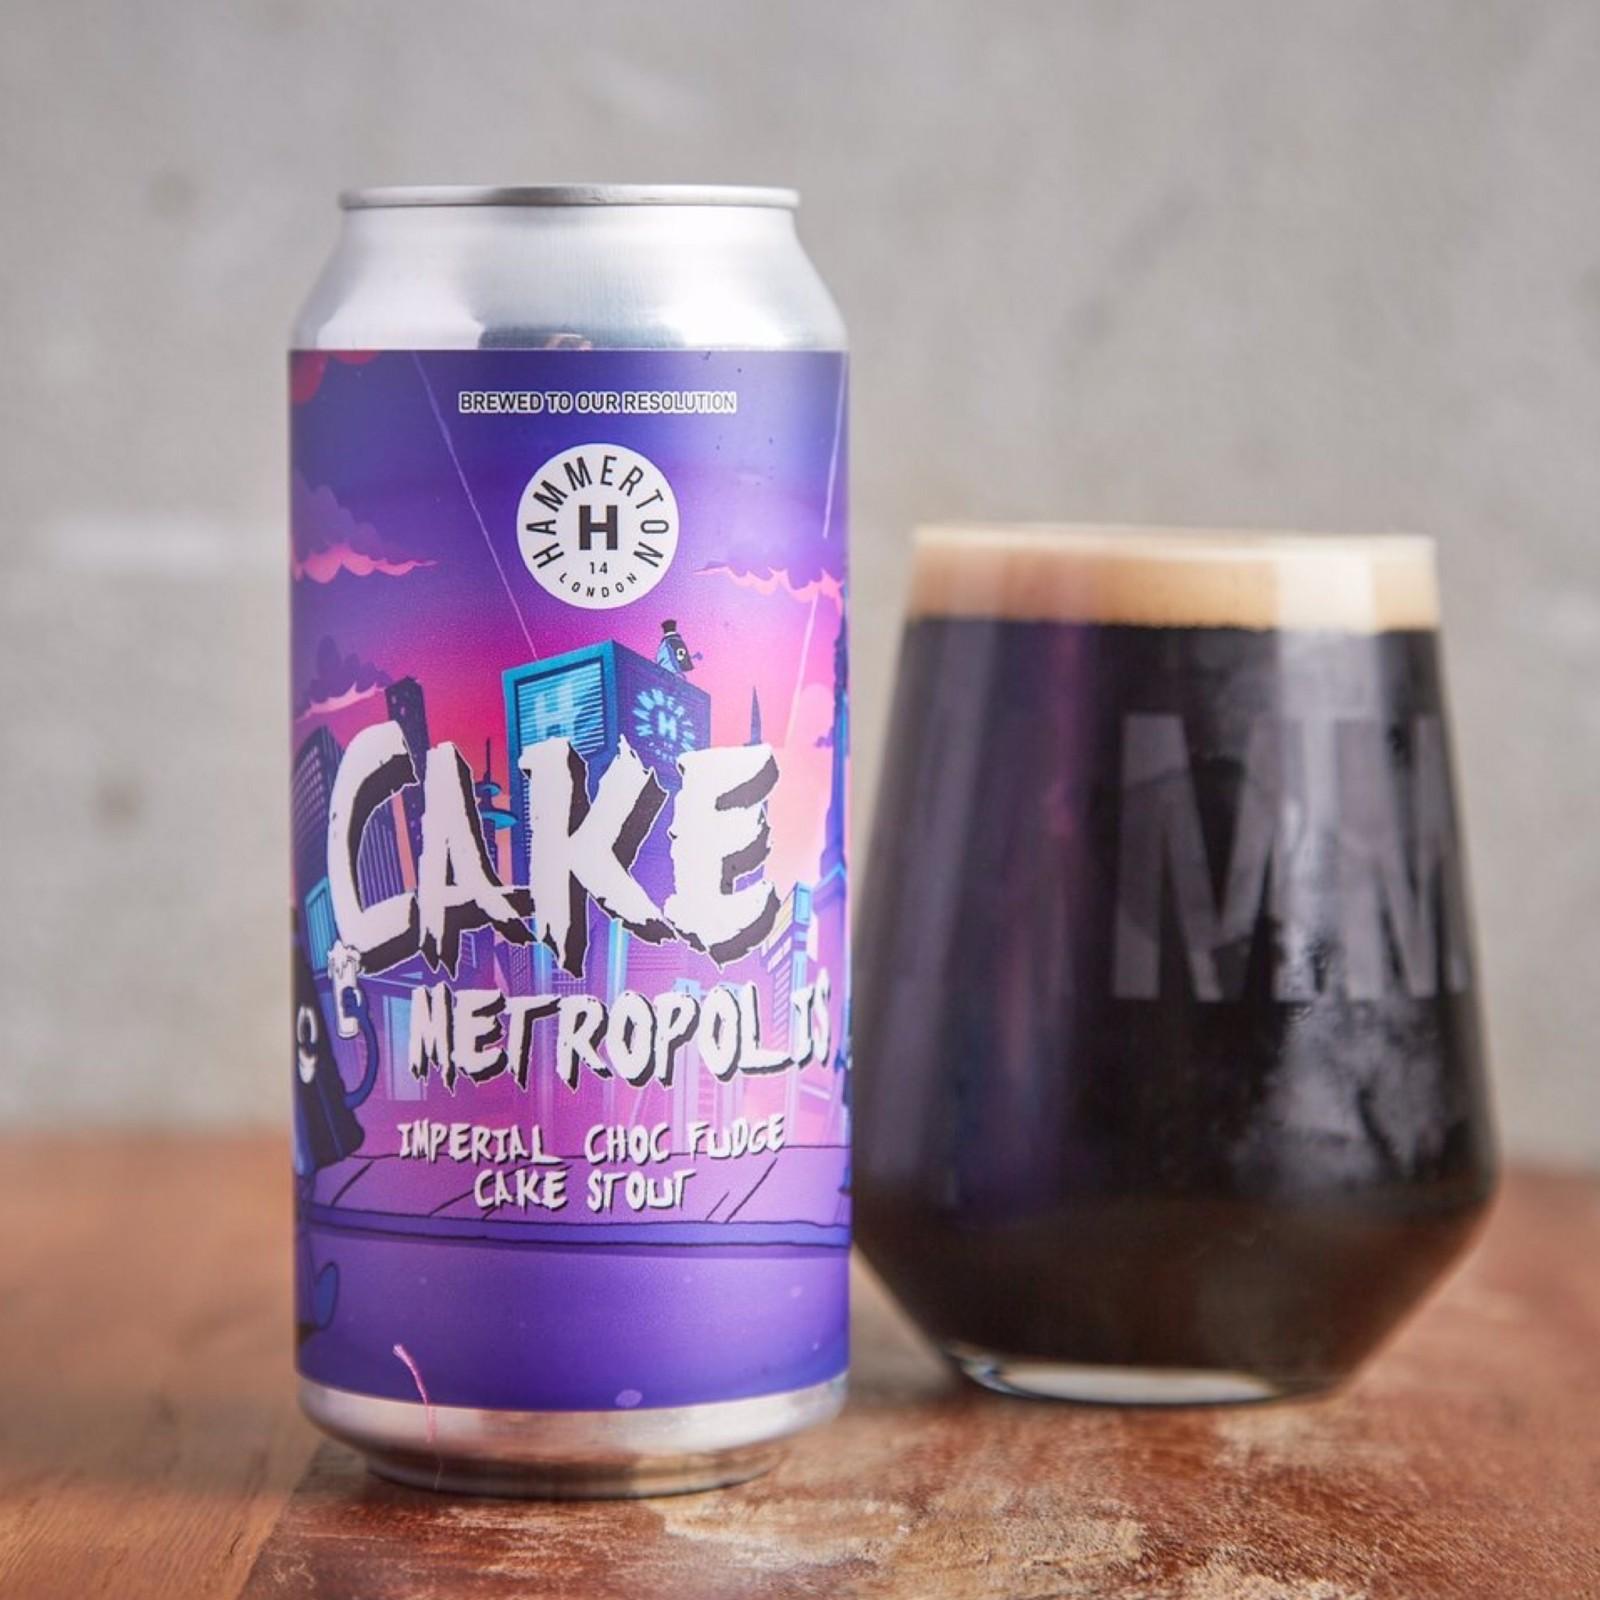 Cake Metropolis - IMPERIAL CHOC, Fudge Cake Stout 11% 440ml Hammerton Brewery